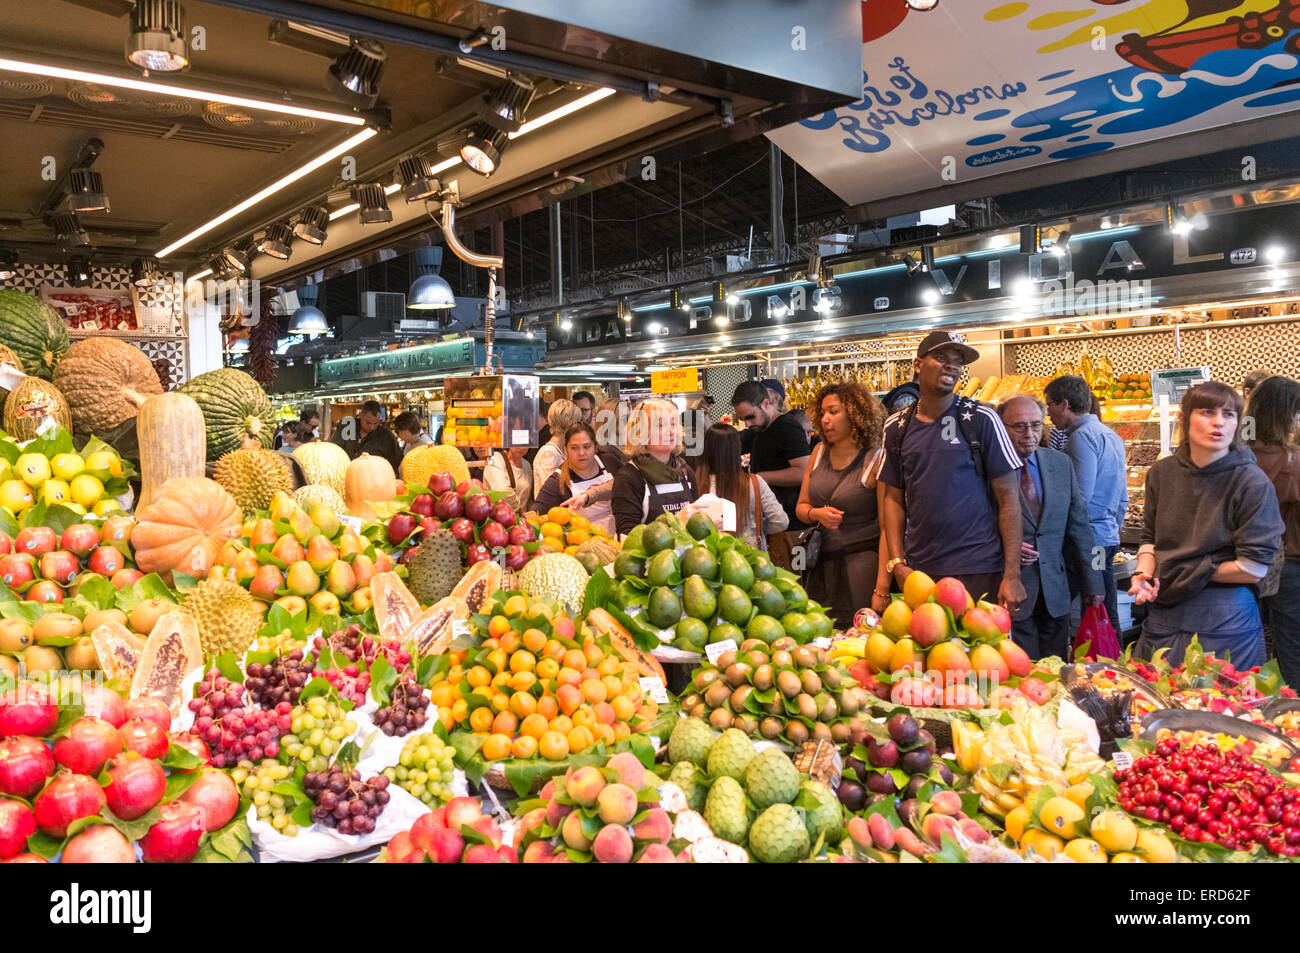 Fruits and vegetables for sale at La Boqueria market, Barcelona, Spain - Stock Image